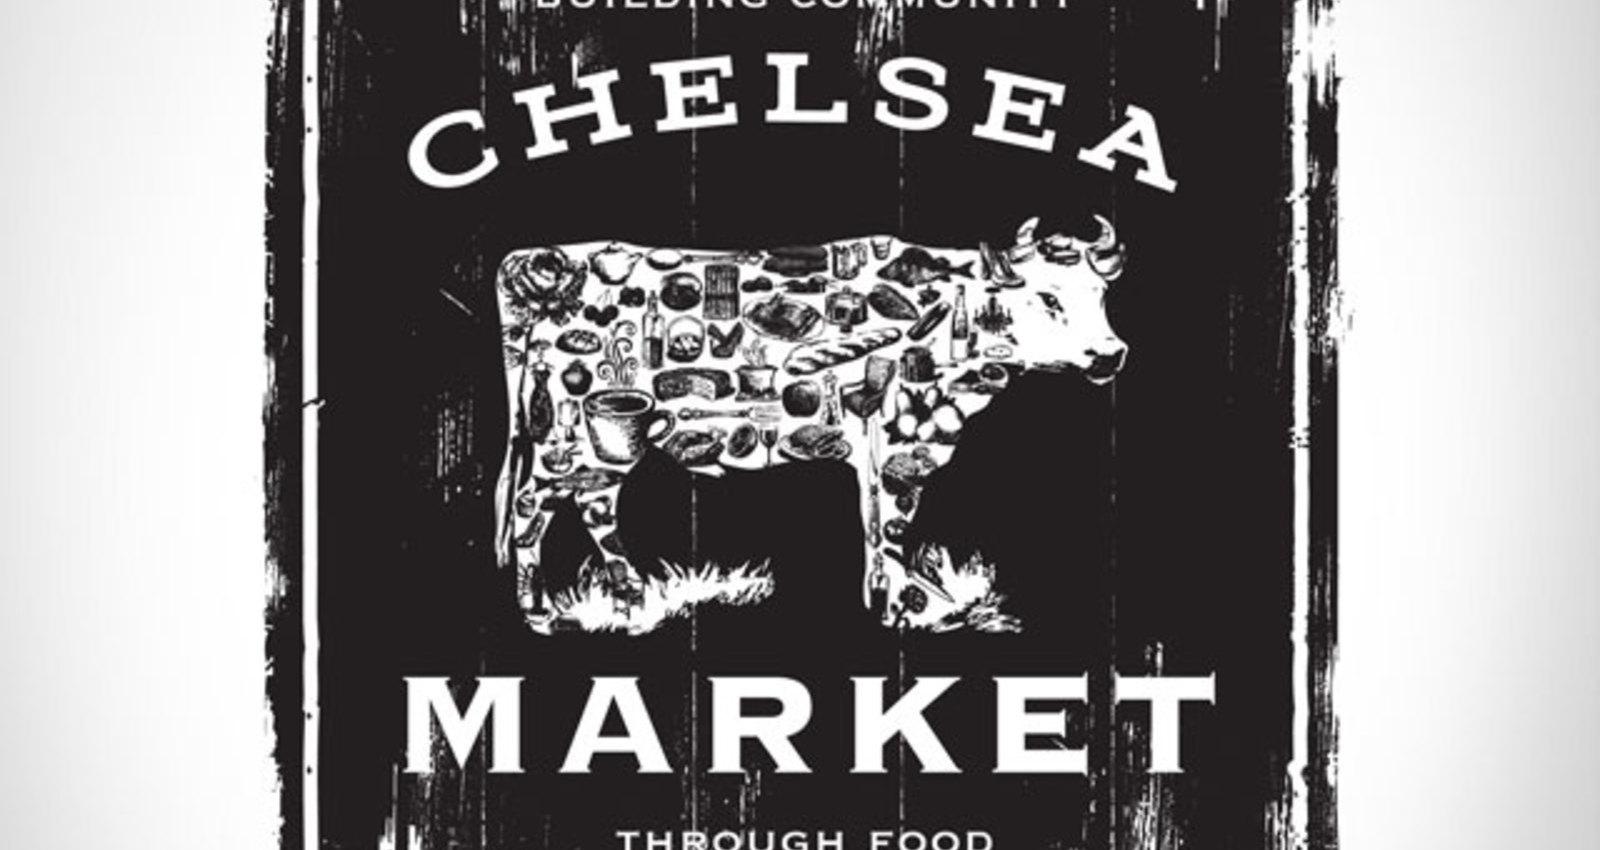 Chelsea Market merchandising logo